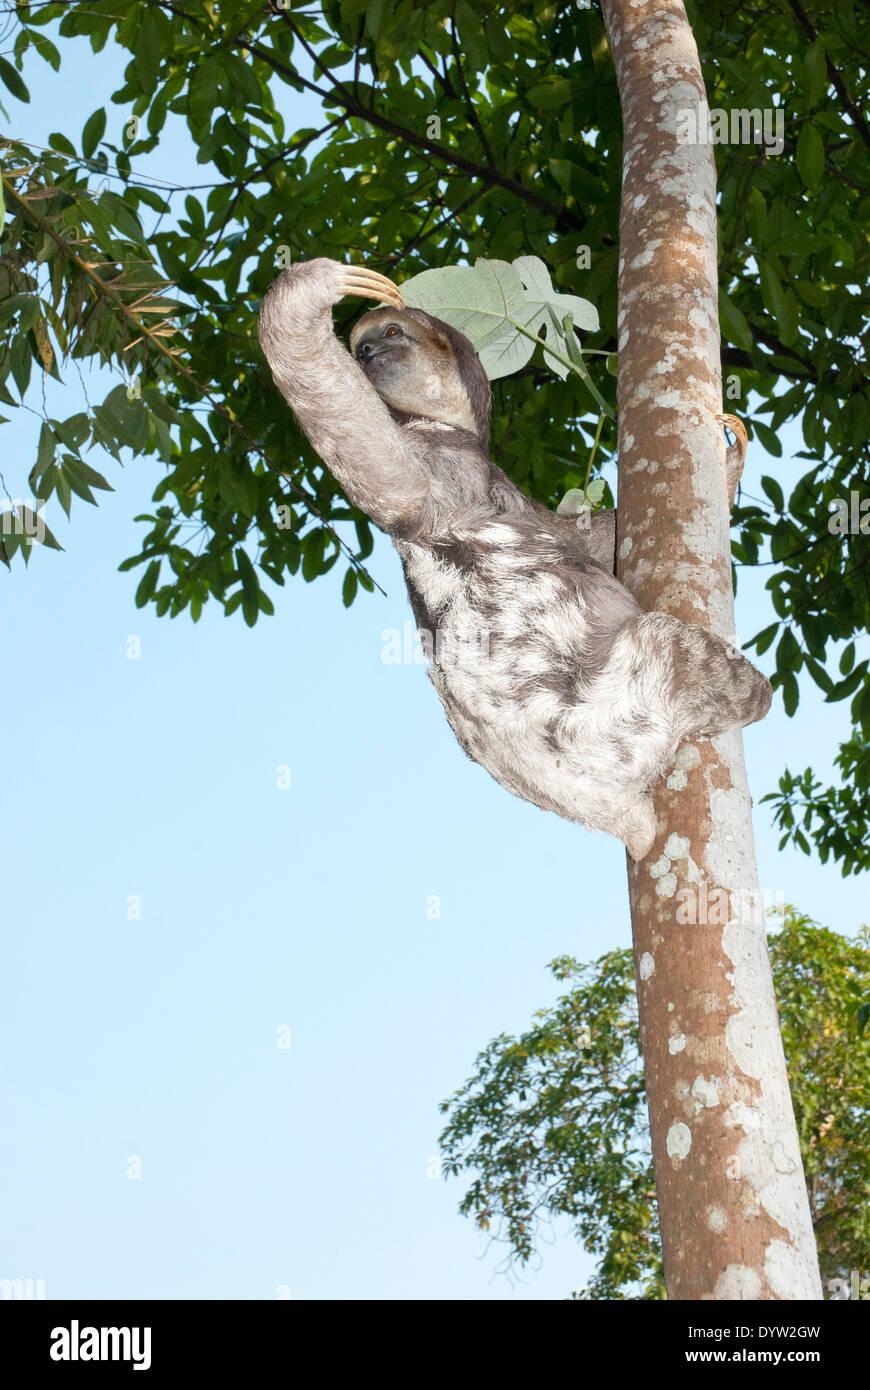 Brown-throated three-toed sloth (Bradypus variegatus) photographed in the Amazon basin near Manaus, Brazil. Stock Photo